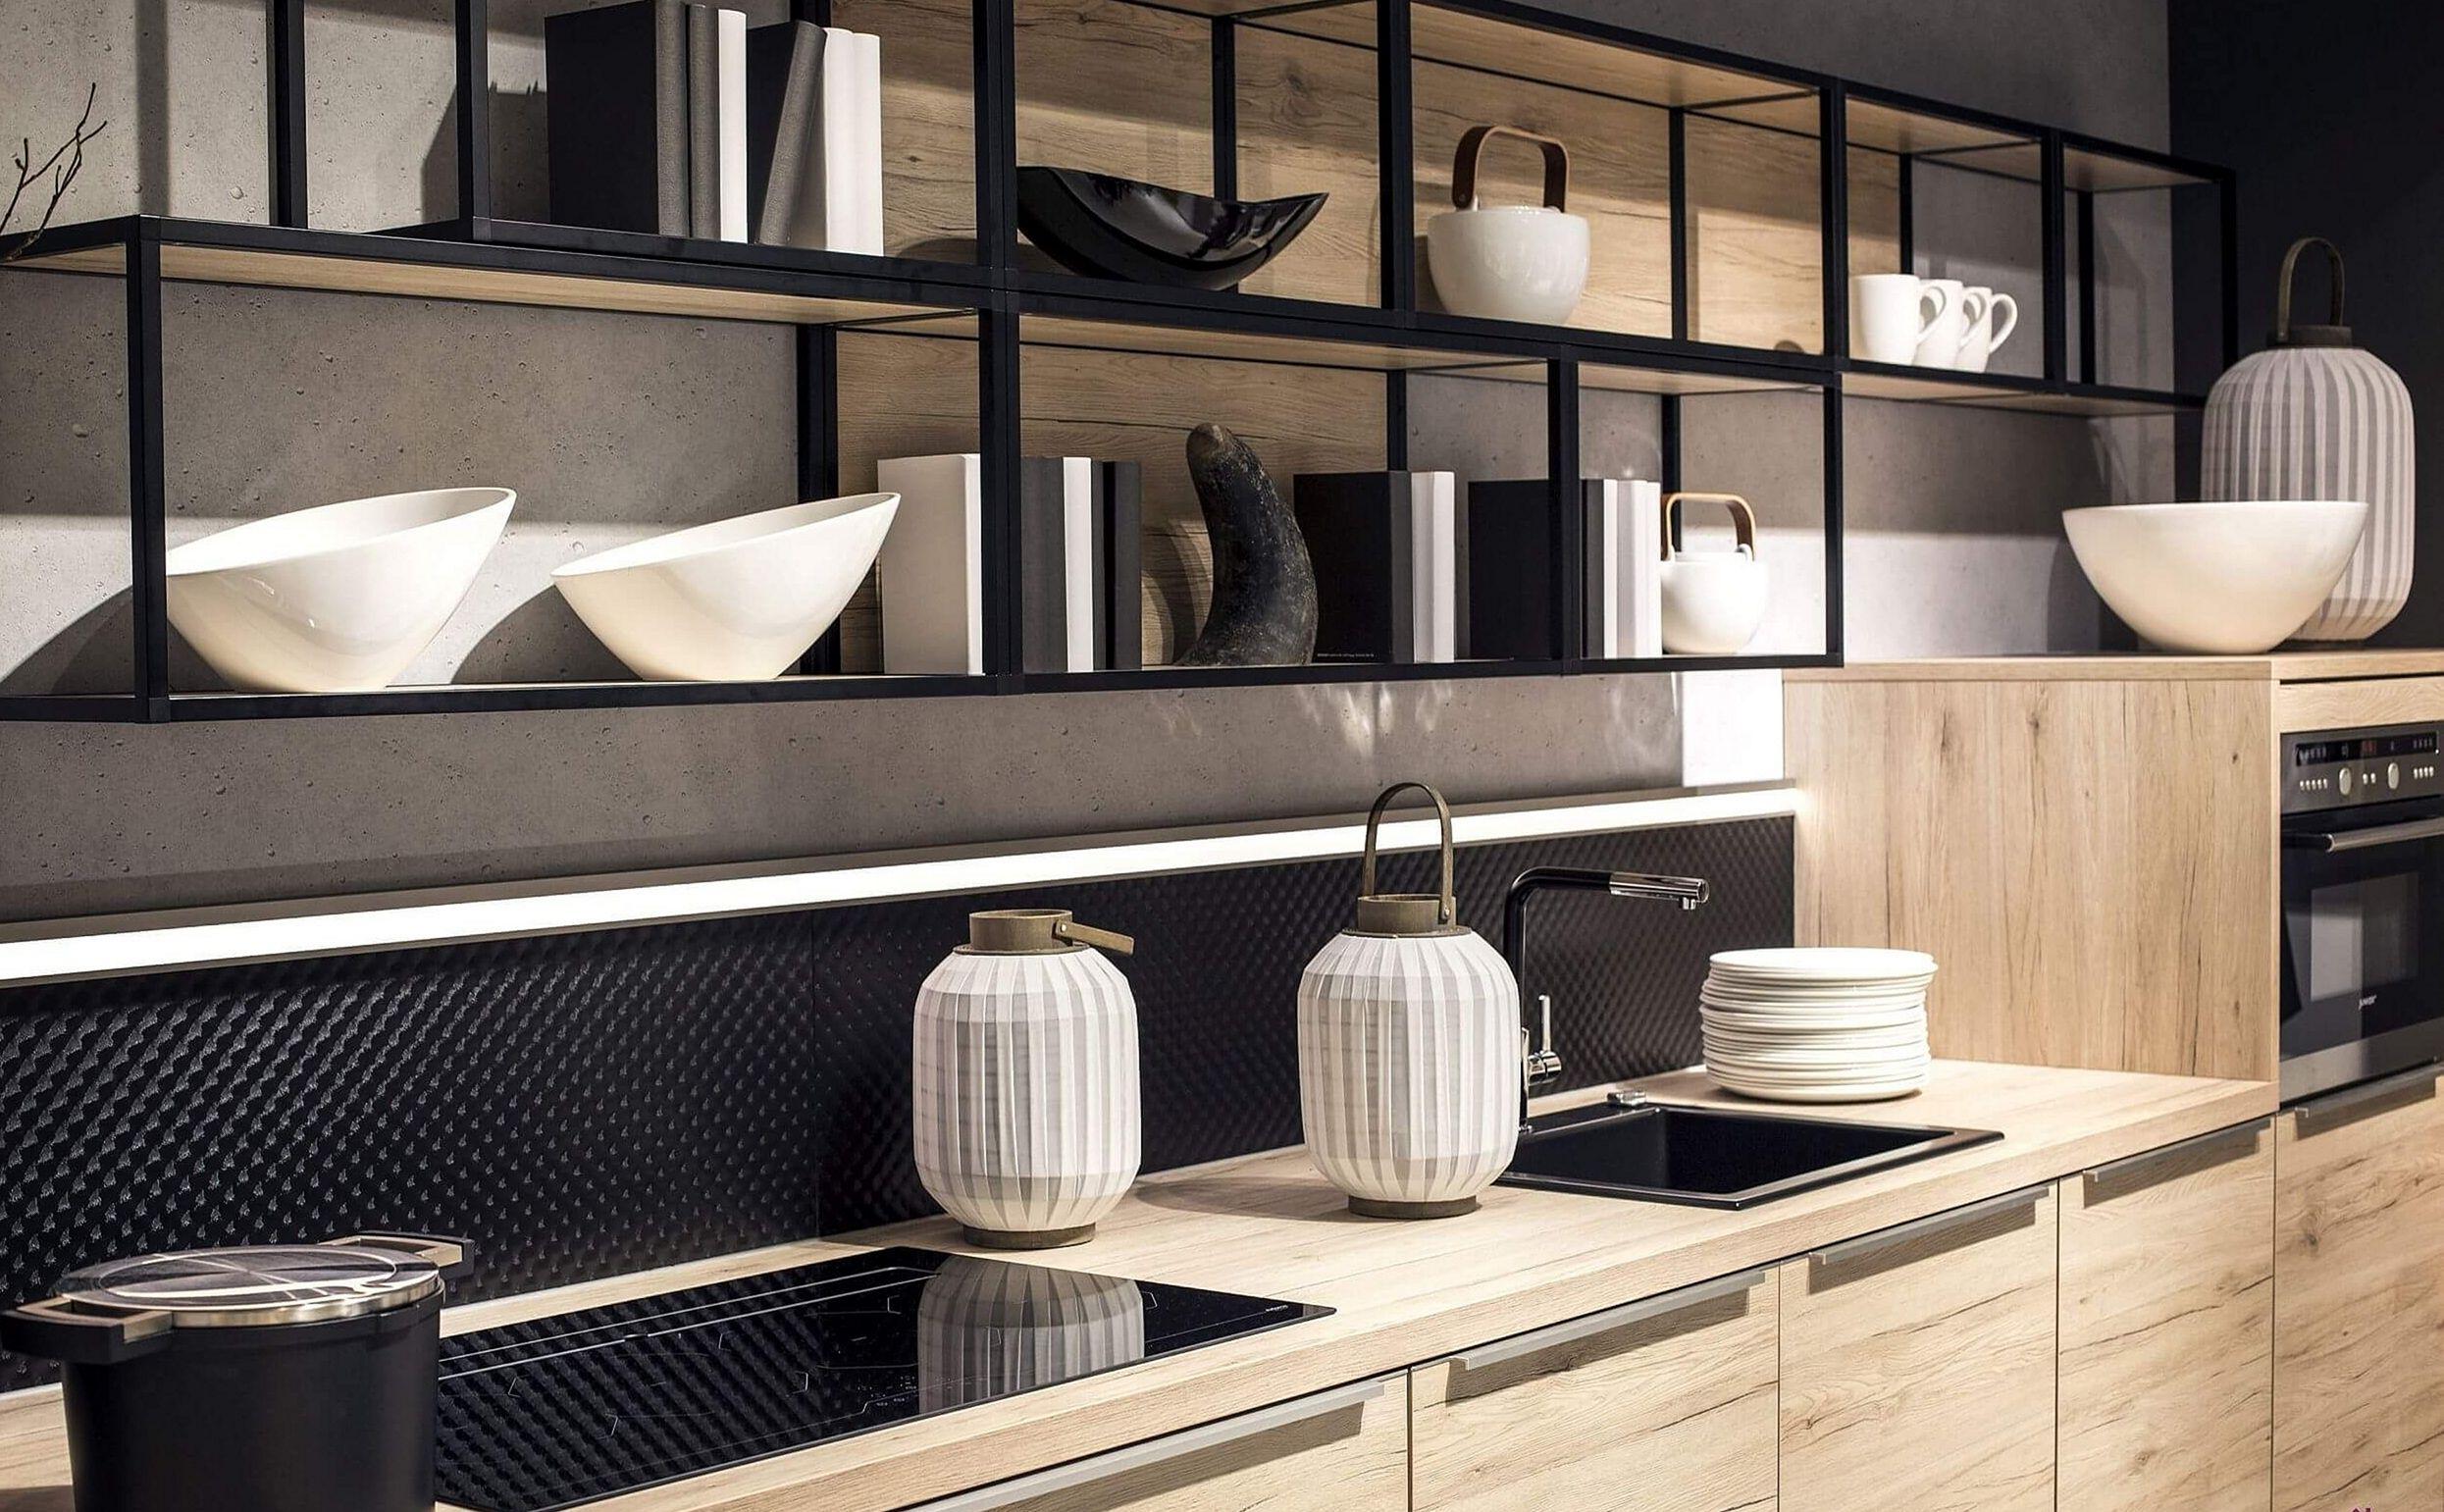 Large Minimalist Kitchen Shelves